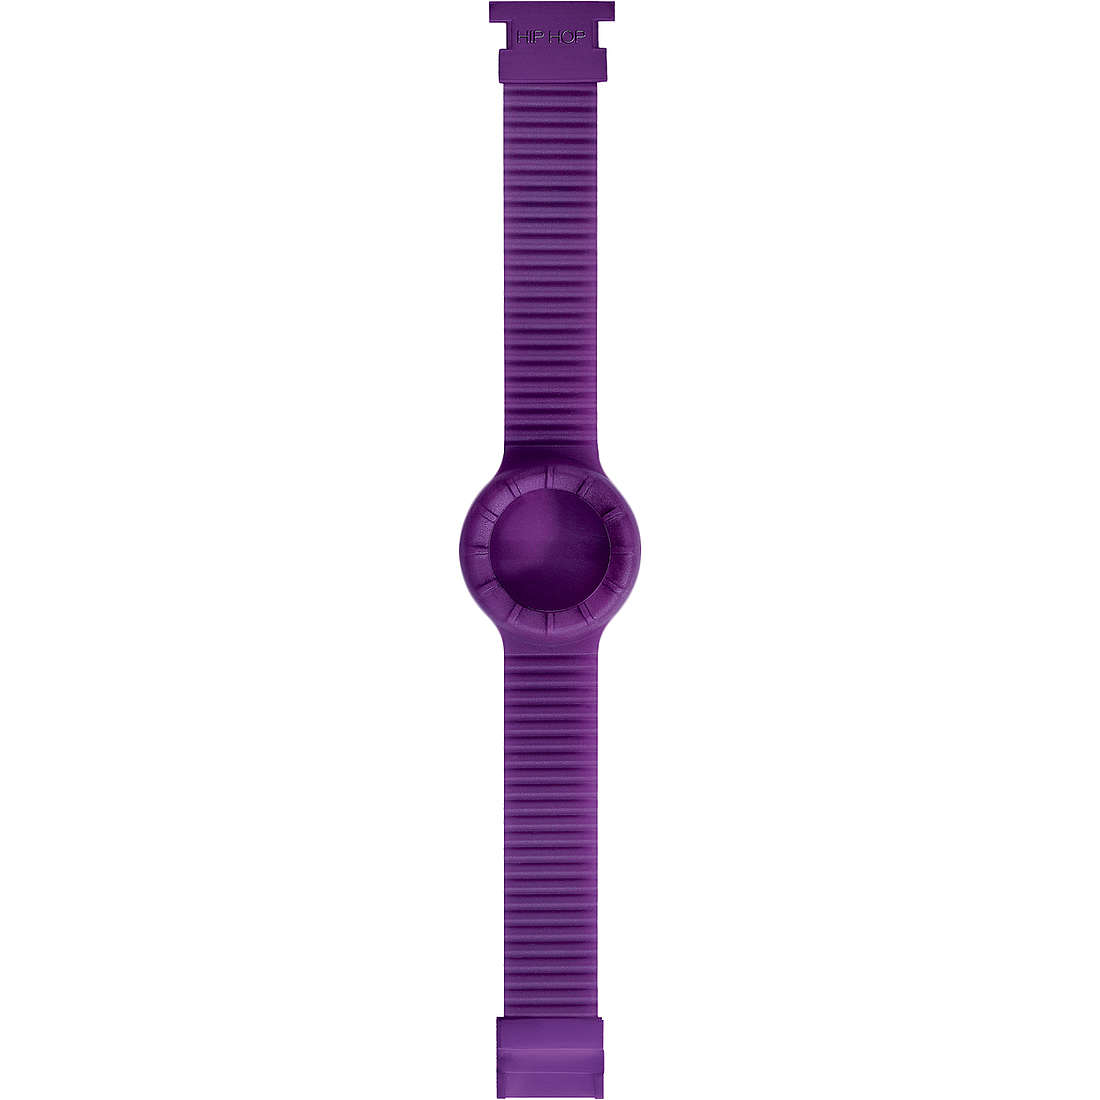 orologio accessorio unisex Hip Hop Hero HBU0008